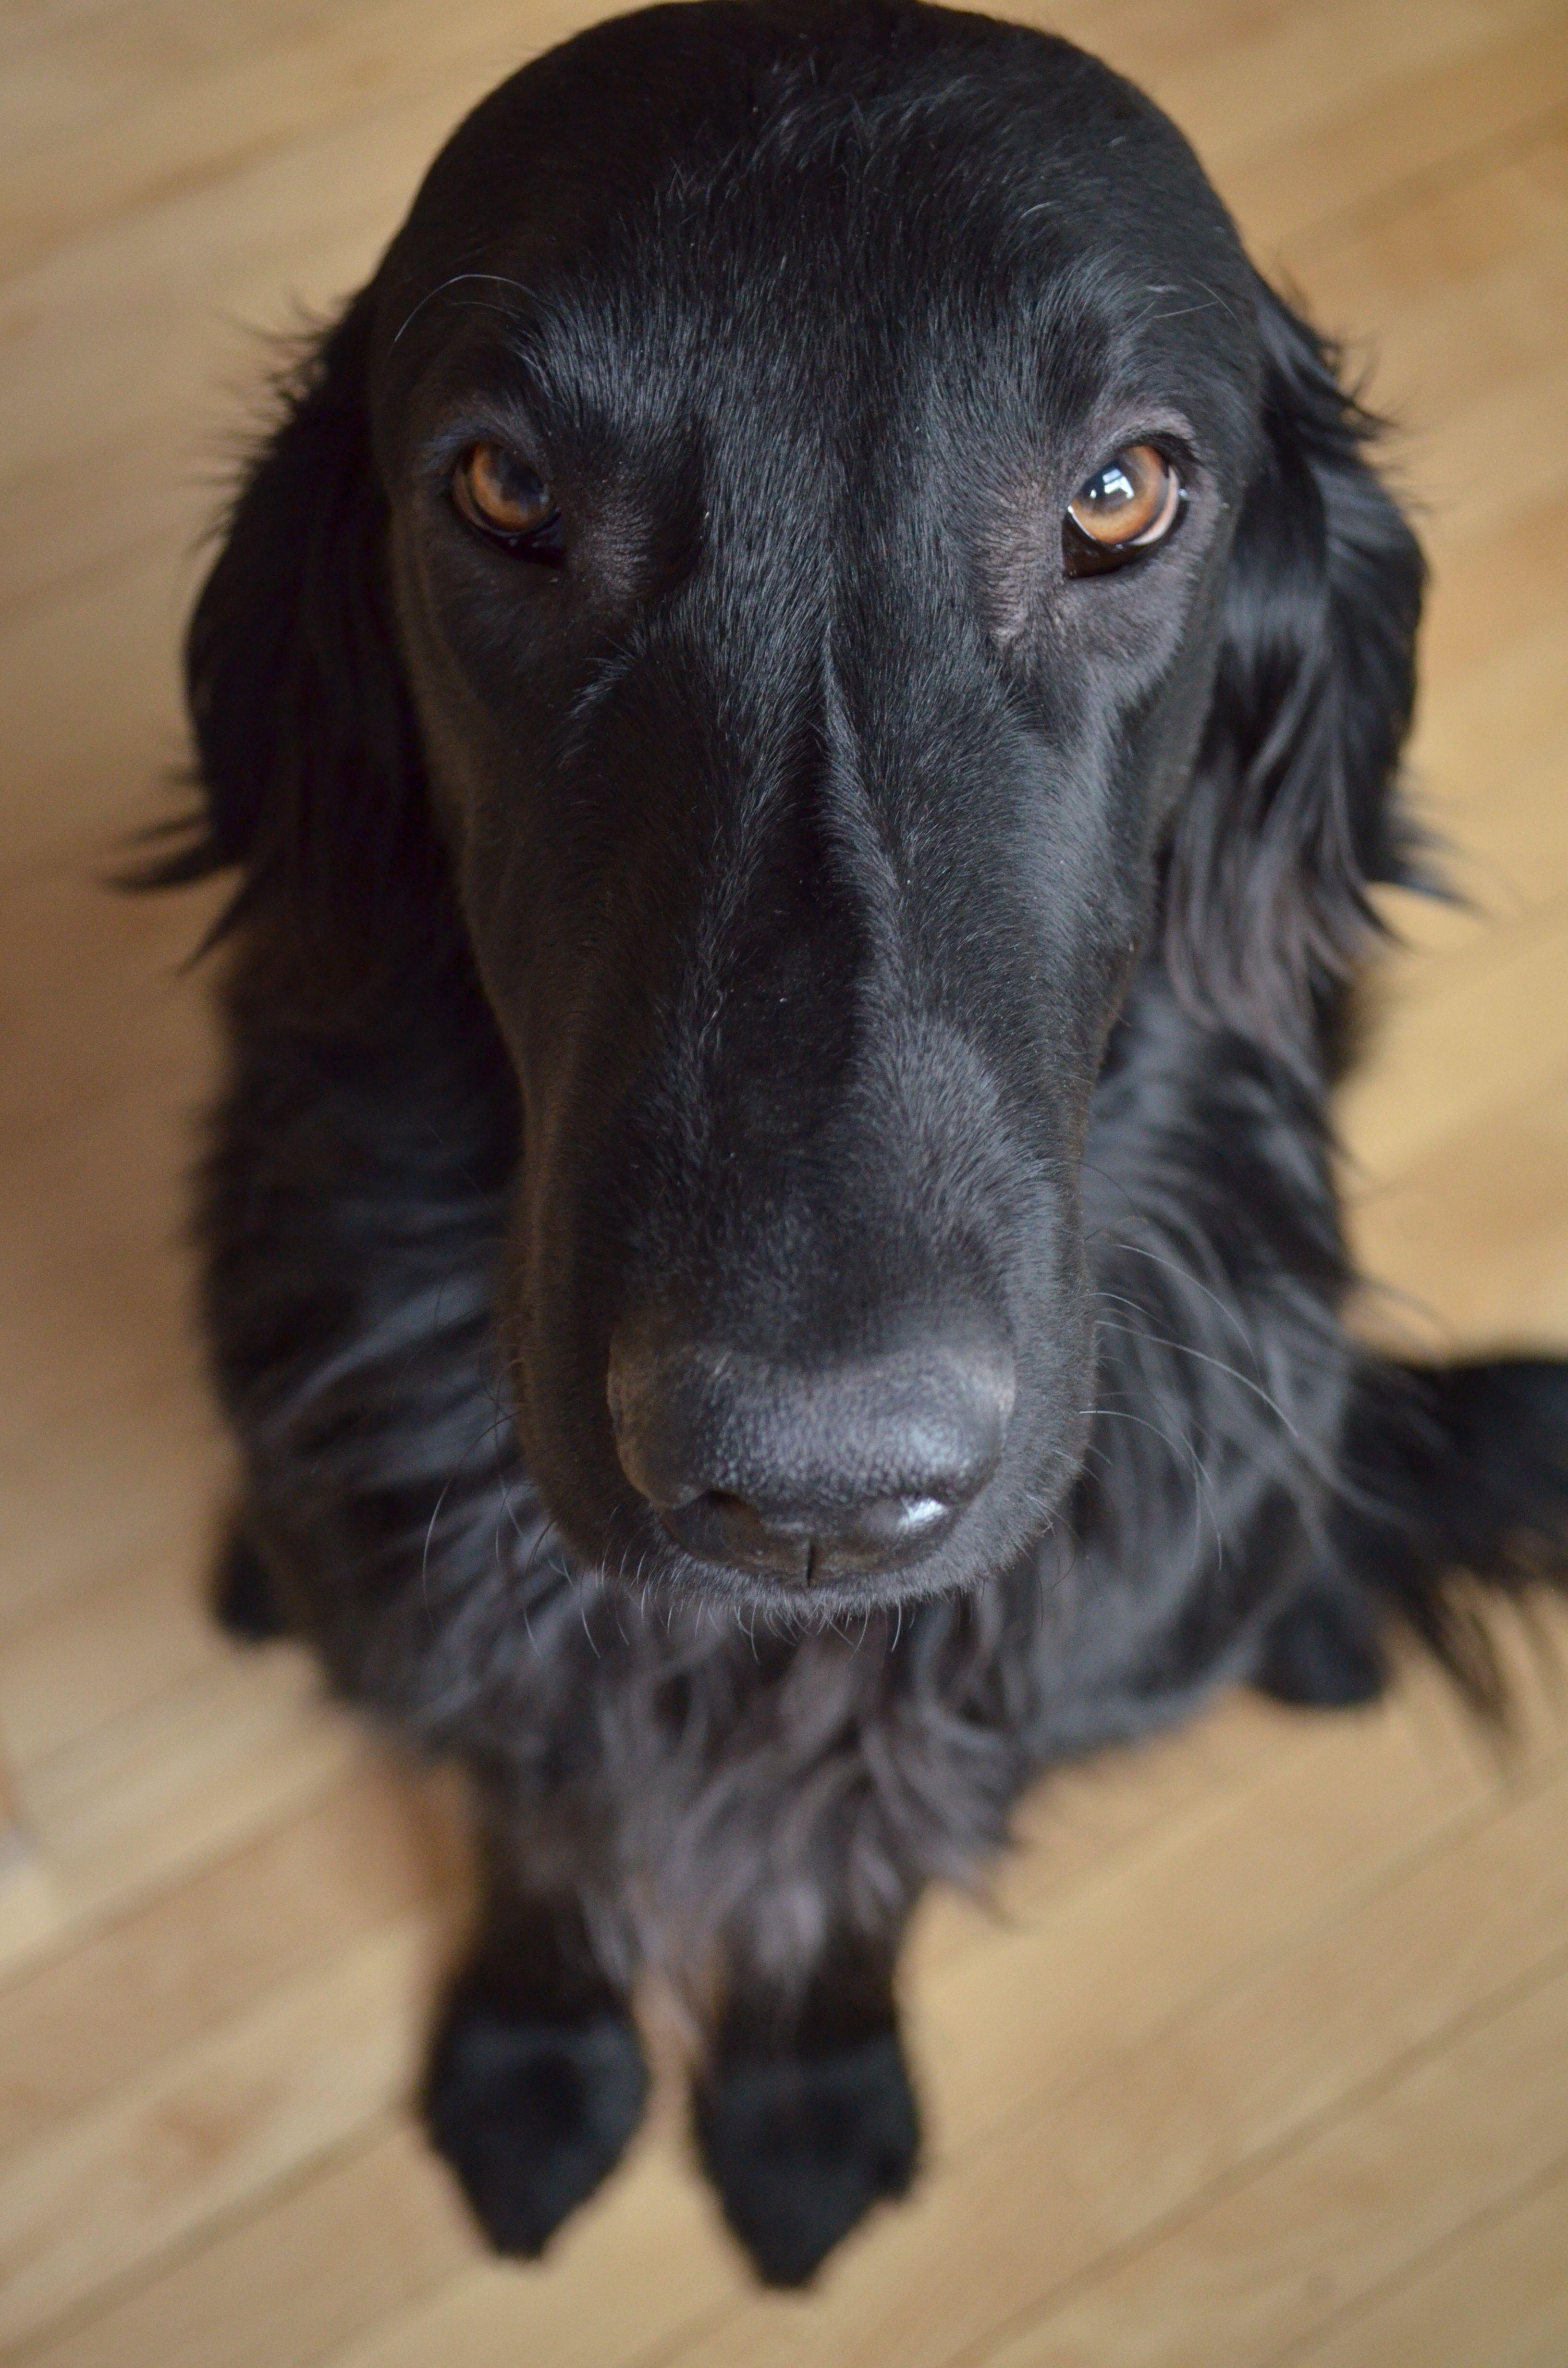 My Flat Coated Retriever, Gus | Cães | Pinterest | Flat coated ...